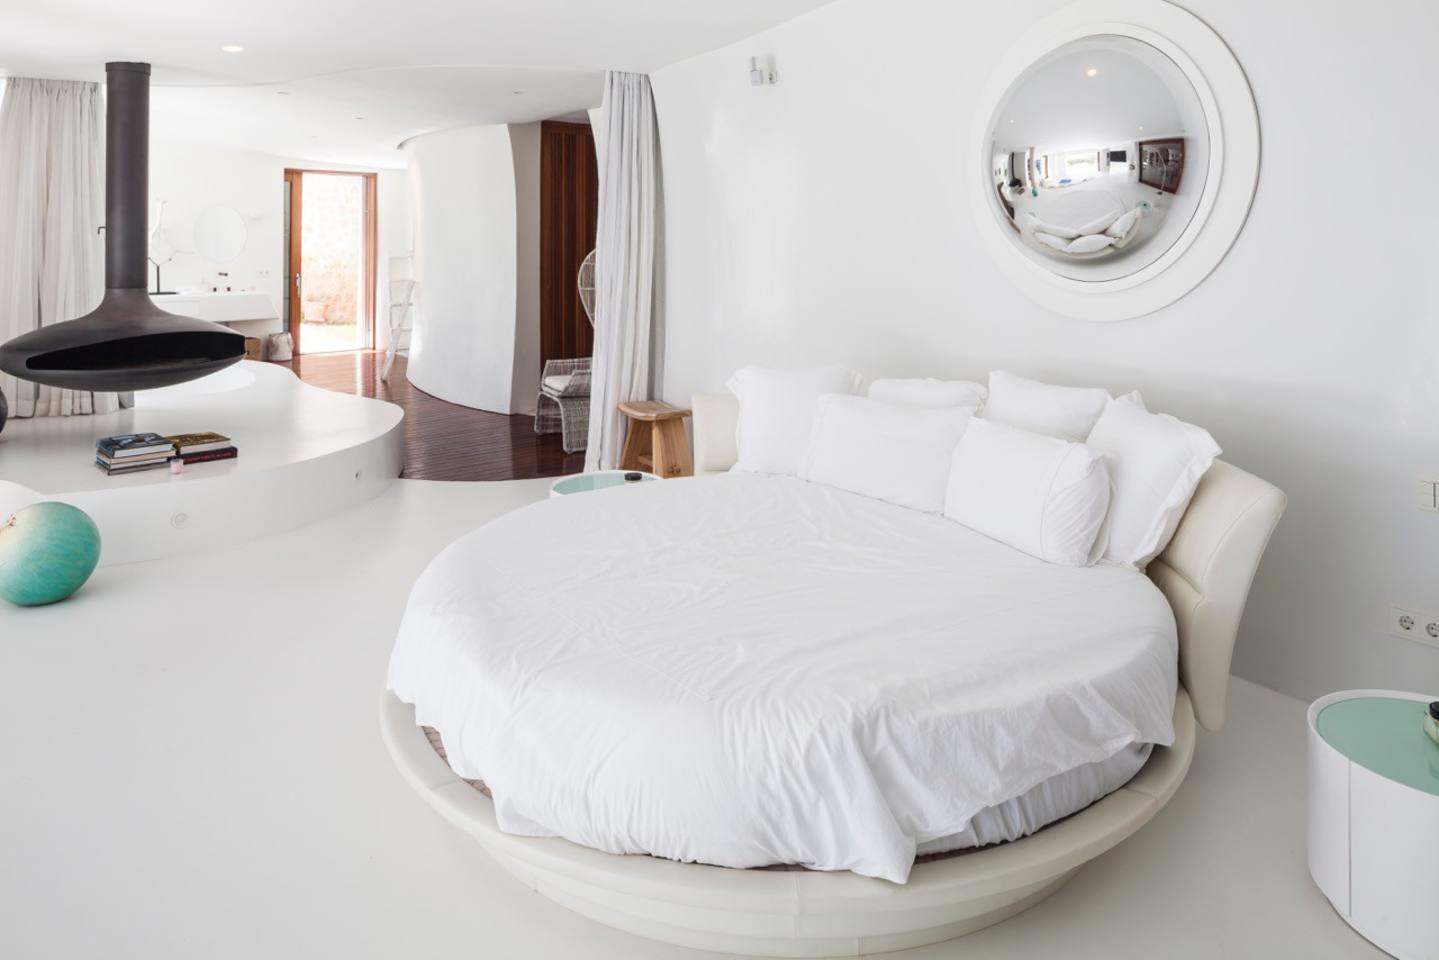 Sensational Villa with a huge infinity pool photo 23926478